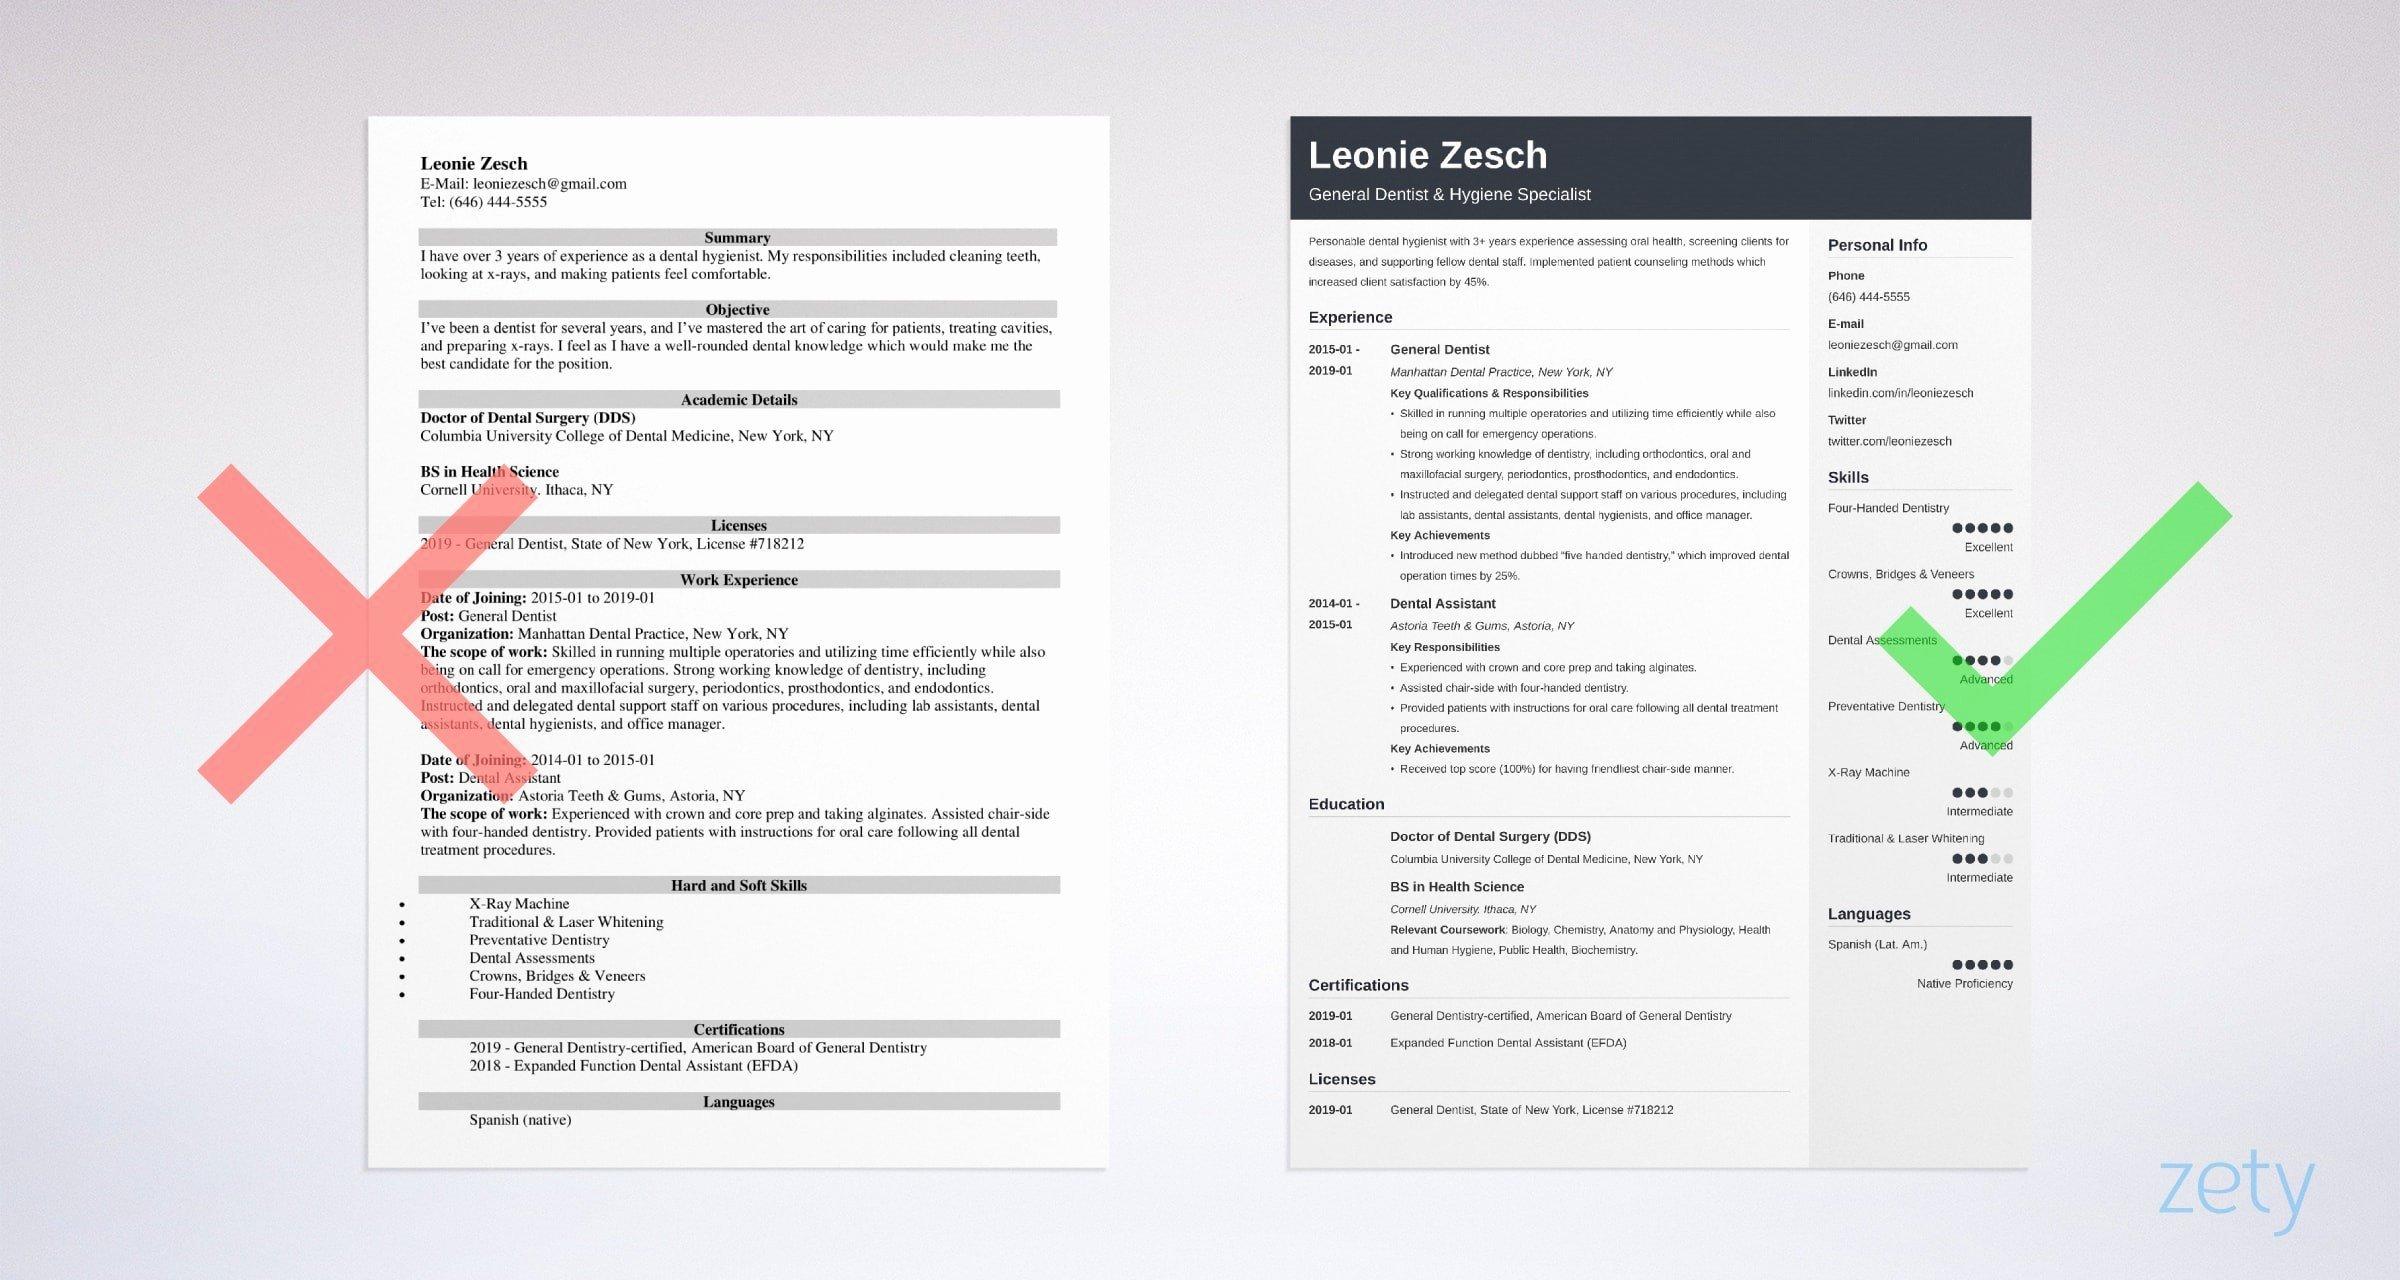 Dental assistant Student Resume Elegant Dentist Resume Sample & Plete Writing Guide [20 Examples]